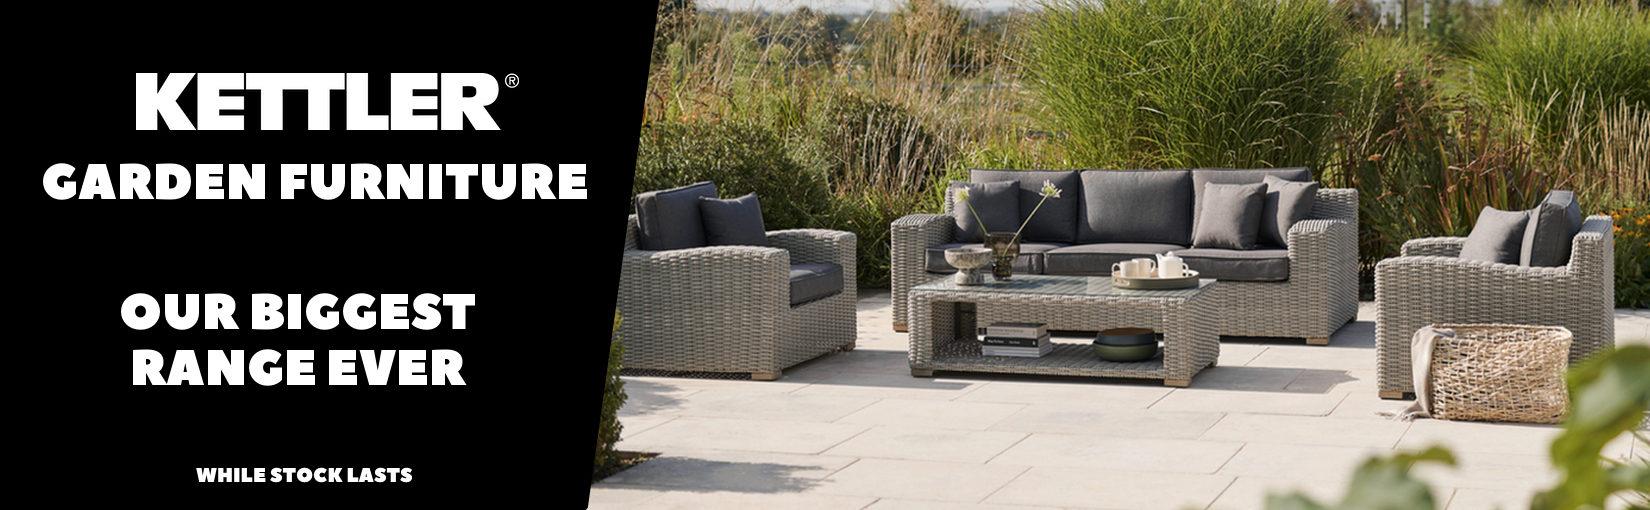 1650X510 Kettler Garden Furniture